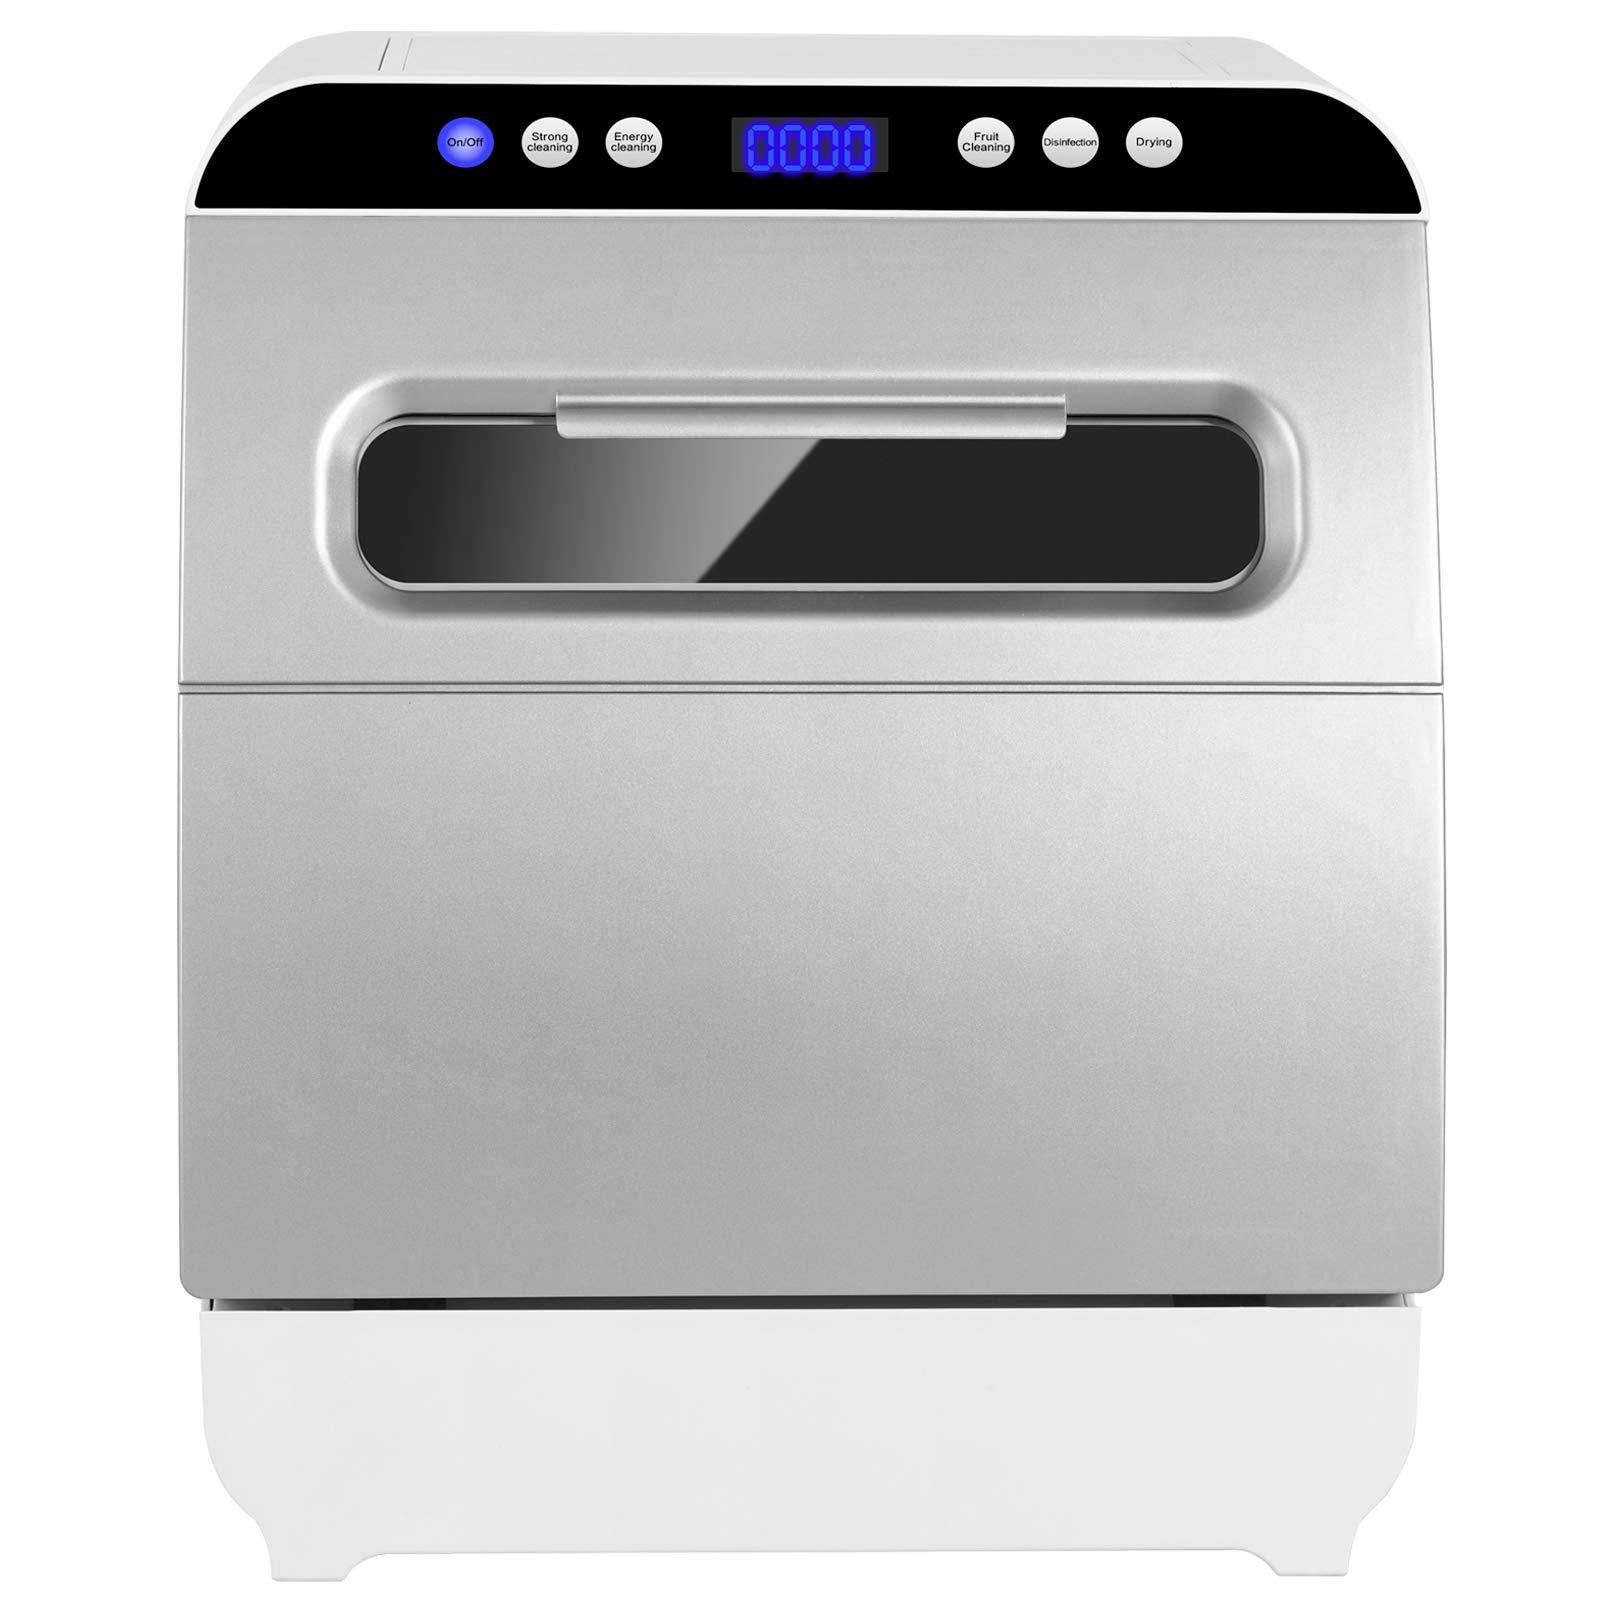 Kuppet Countertop Dishwasher, Portable Dishwasher with 6 Place Setting, 5 One-Botton Control Washing Programme, Vegetable &Fruit Washing,Air-dry Function,Silver